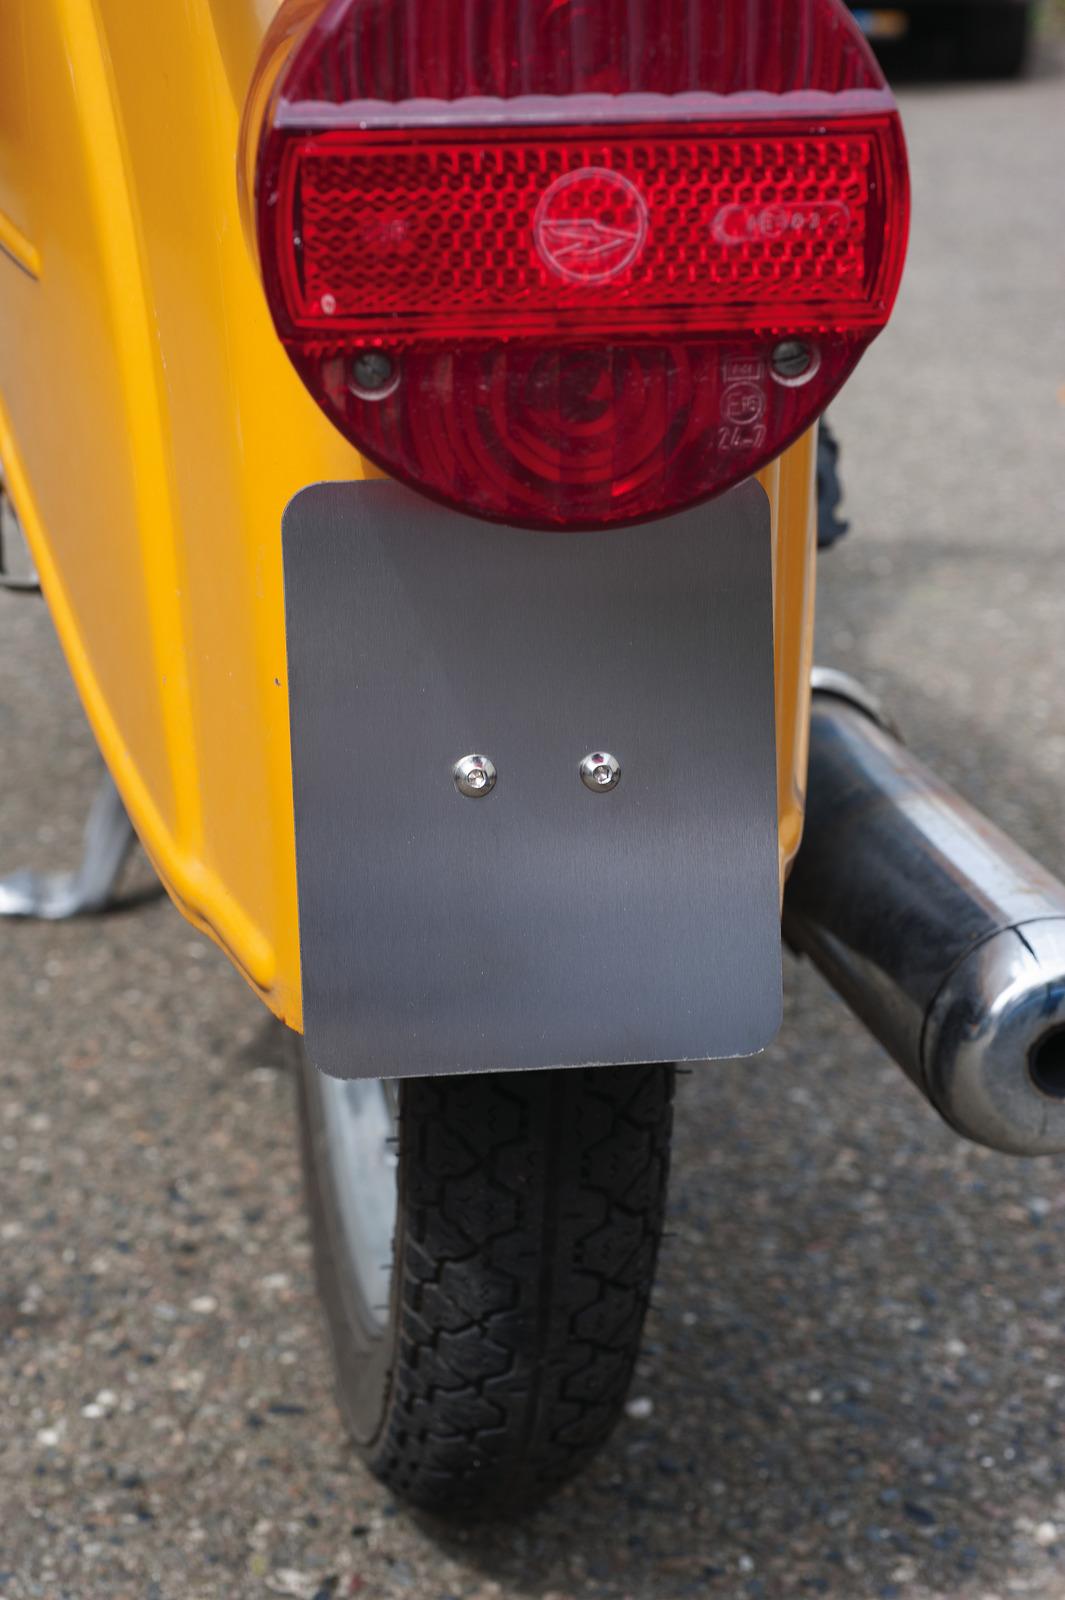 mofa moped roller kennzeichenhalter edelstahl inkl. Black Bedroom Furniture Sets. Home Design Ideas